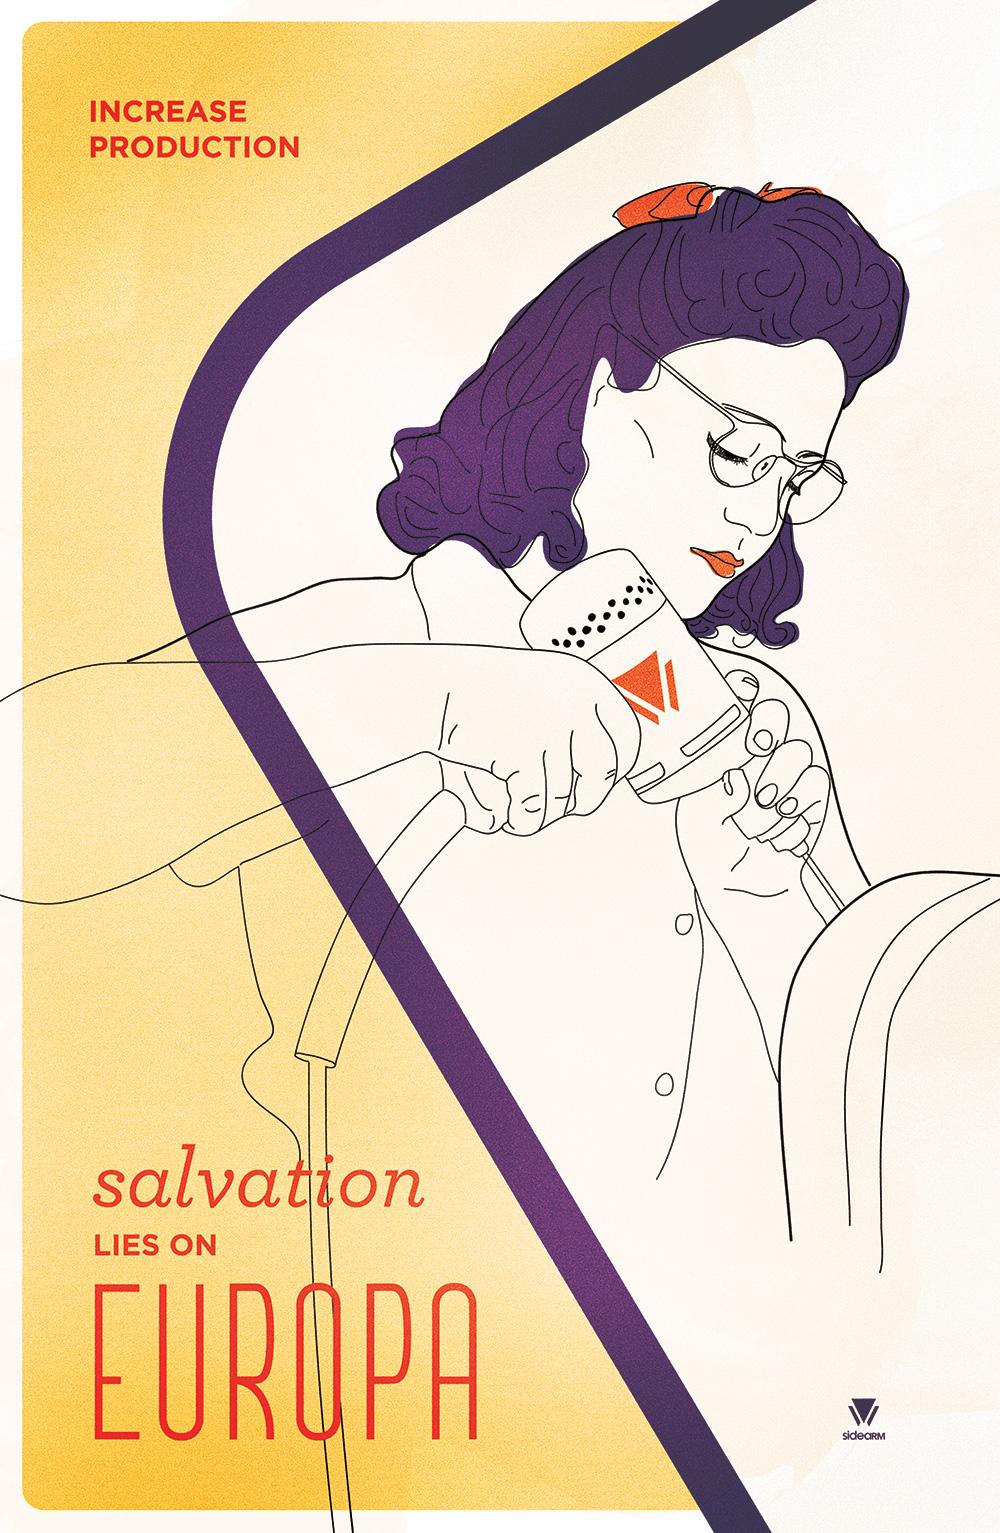 europa_salvation